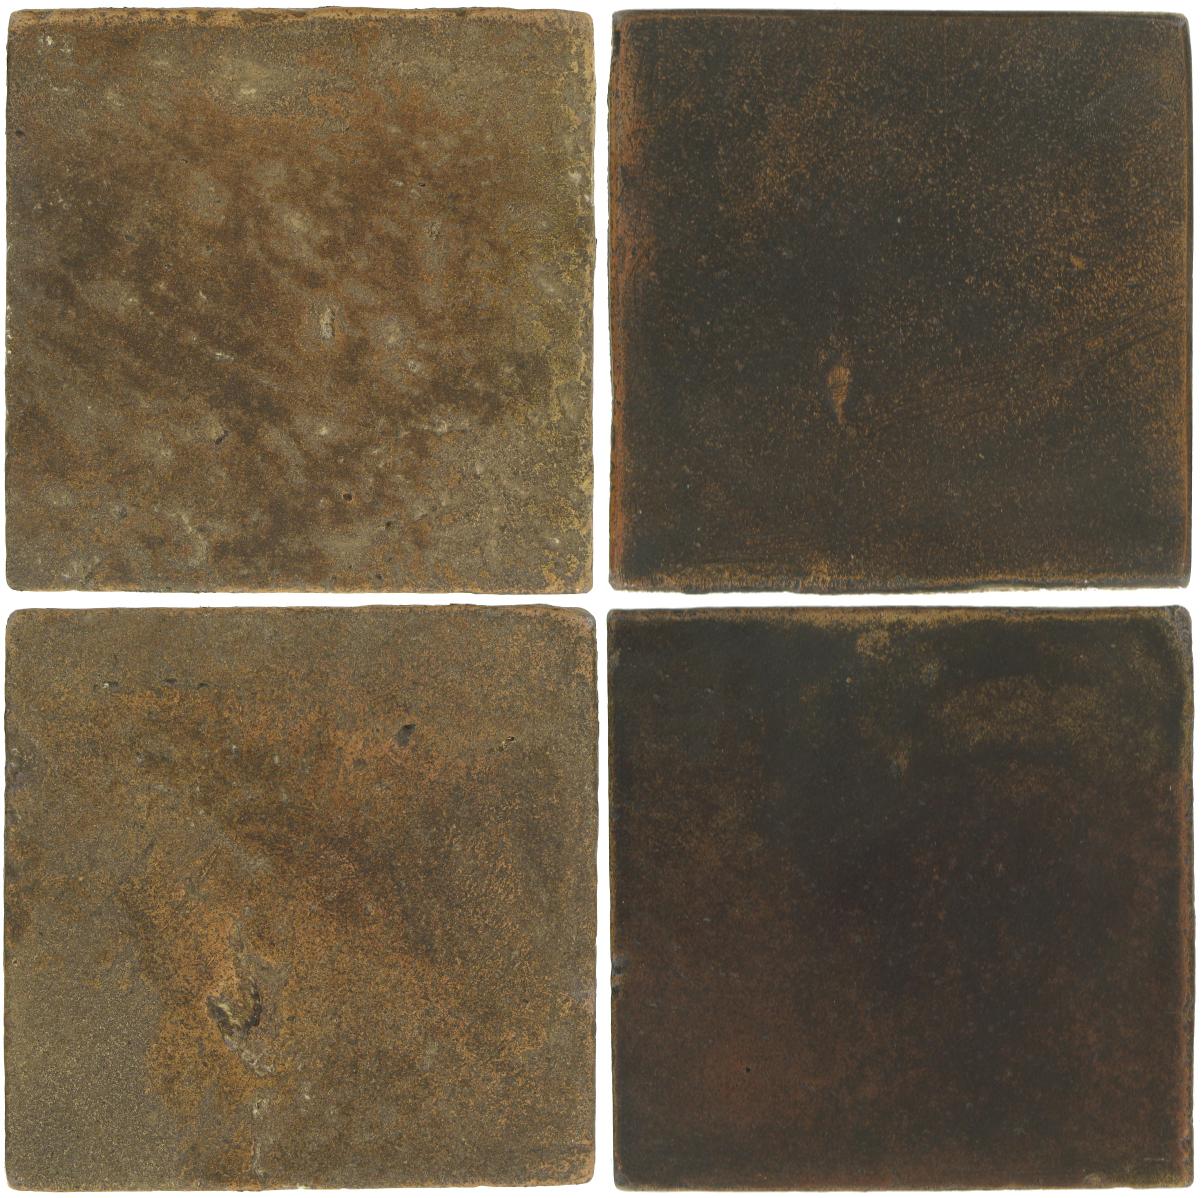 Pedralbes Antique Terracotta  2 Color Combinations  VTG-PSVN Verona Brown + OHS-PSCO Cologne Brown